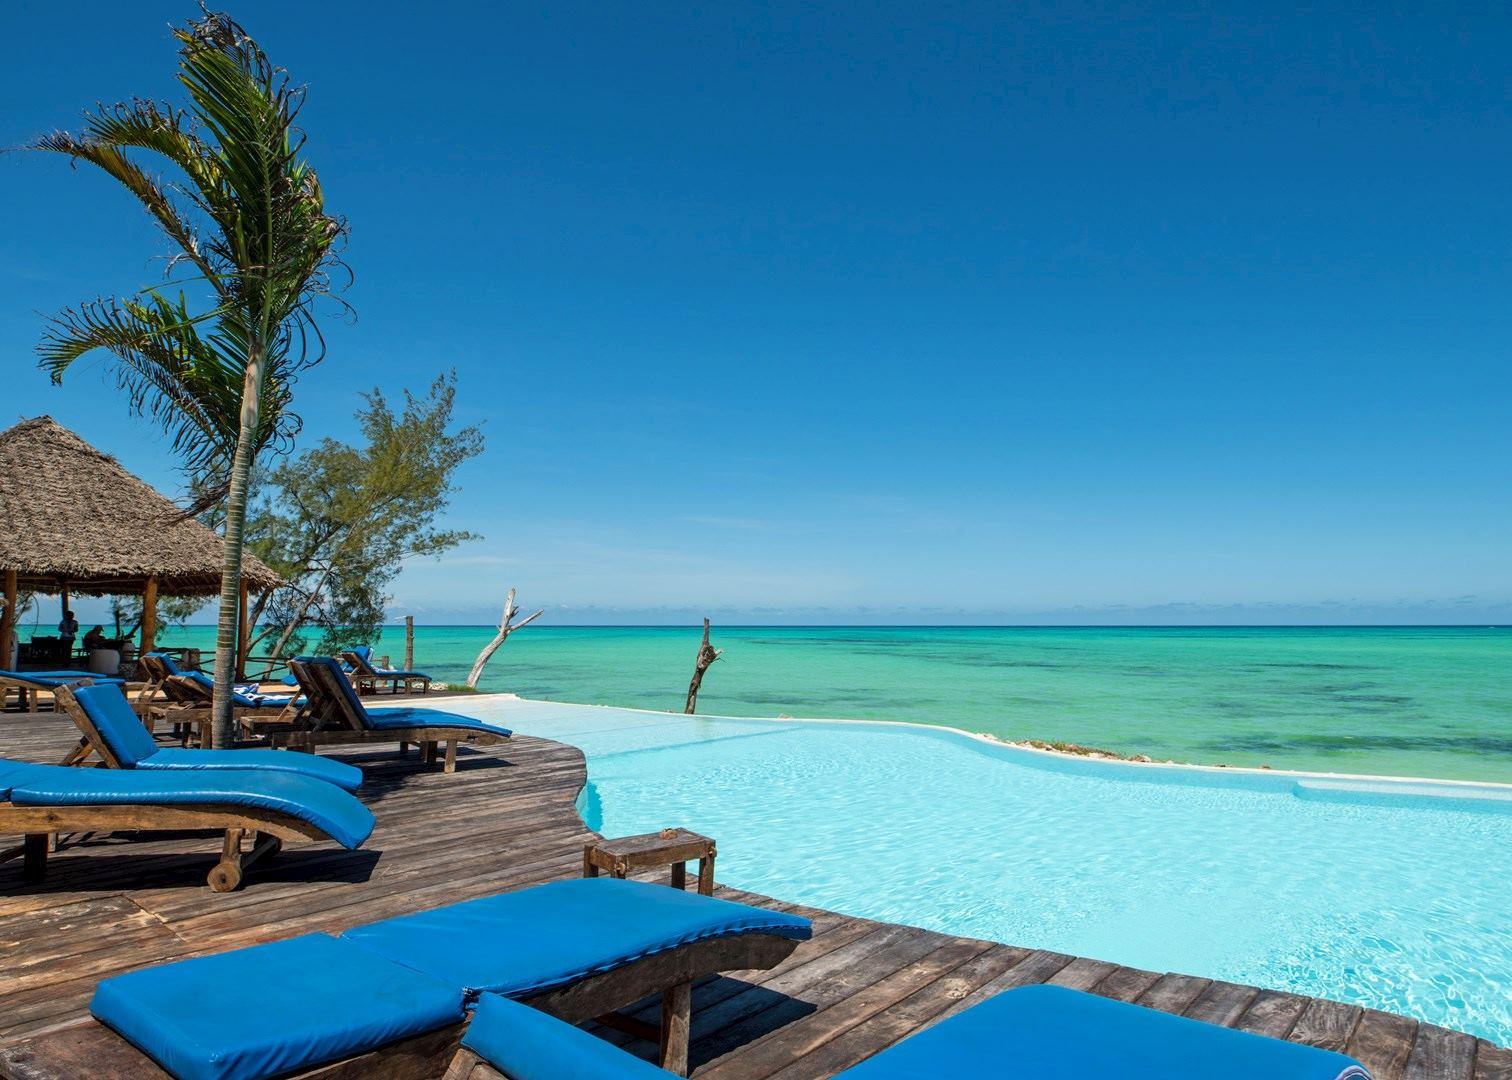 pongwe beach hotel hotels in zanzibar audley travel. Black Bedroom Furniture Sets. Home Design Ideas